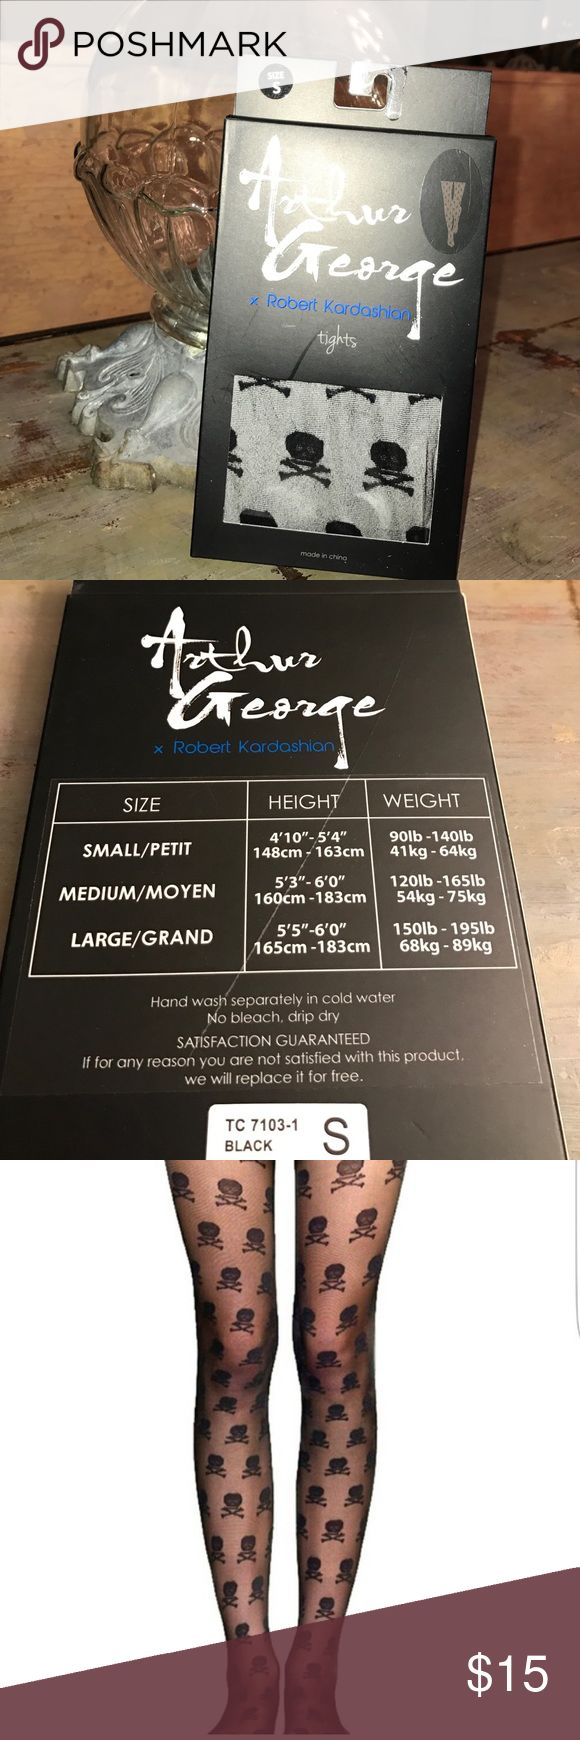 Arthur George tights by Rob Kardashian Skull tights by Arthur George Arthur George Accessories Hosiery & Socks